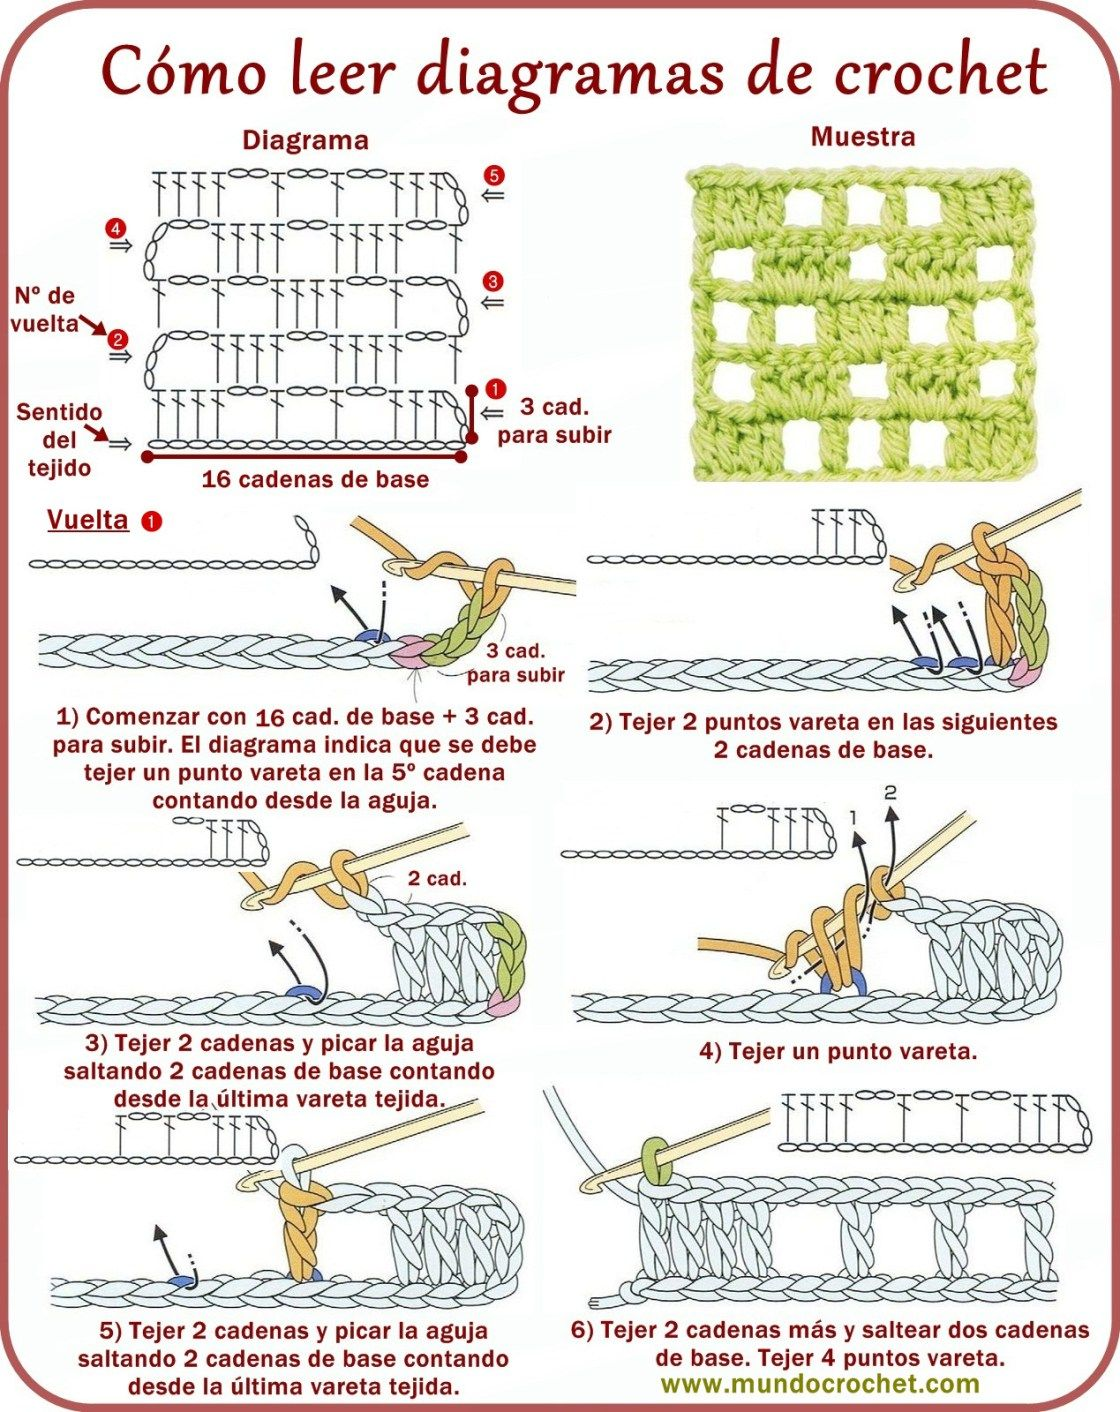 Leer diagramas crochet reading crochet diagrams leer diagramas crochet reading crochet diagrams pooptronica